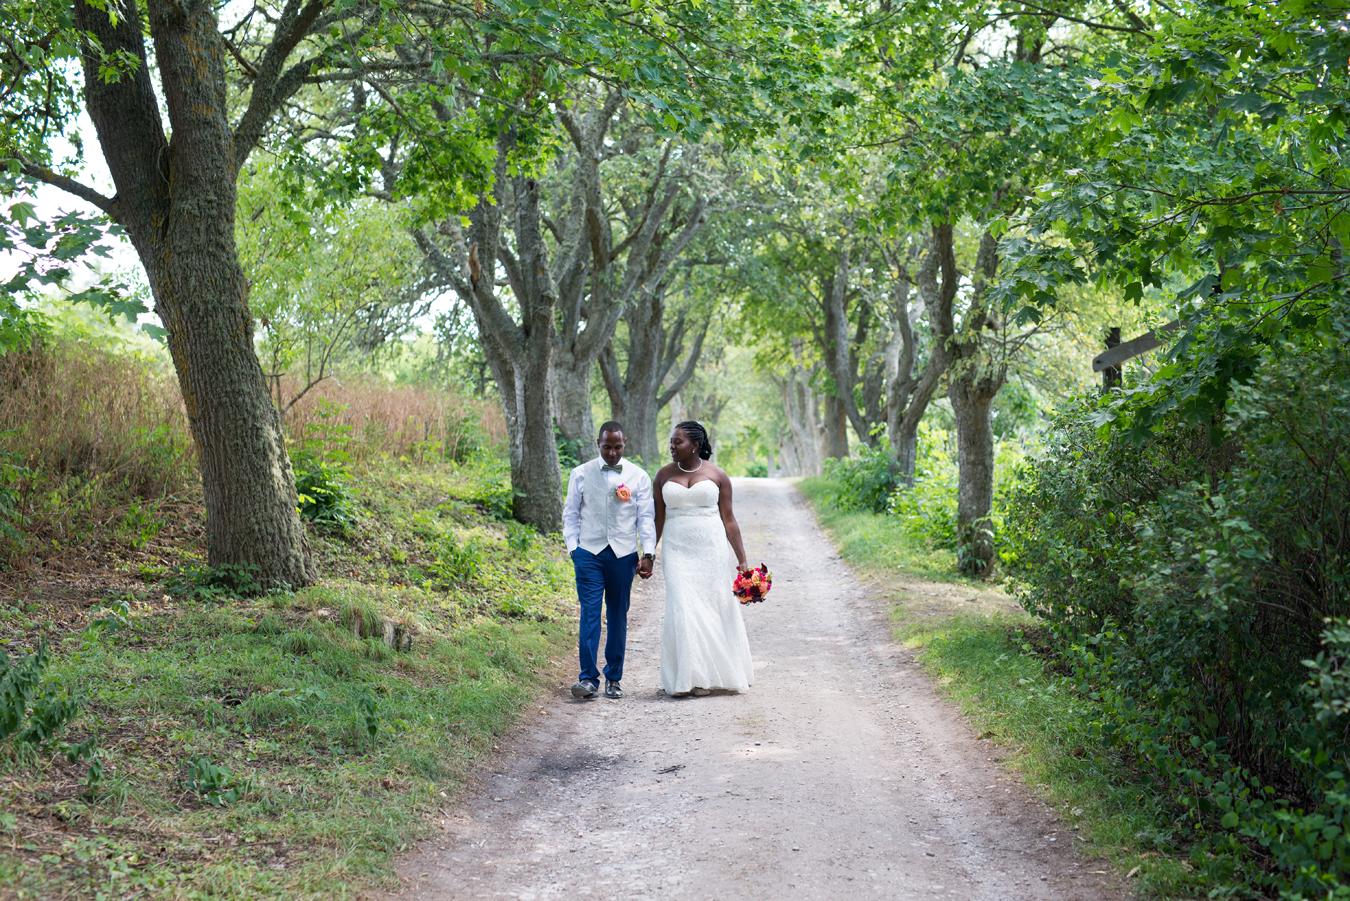 033-bröllop-gotland-fridhem-neas-fotografi.jpg